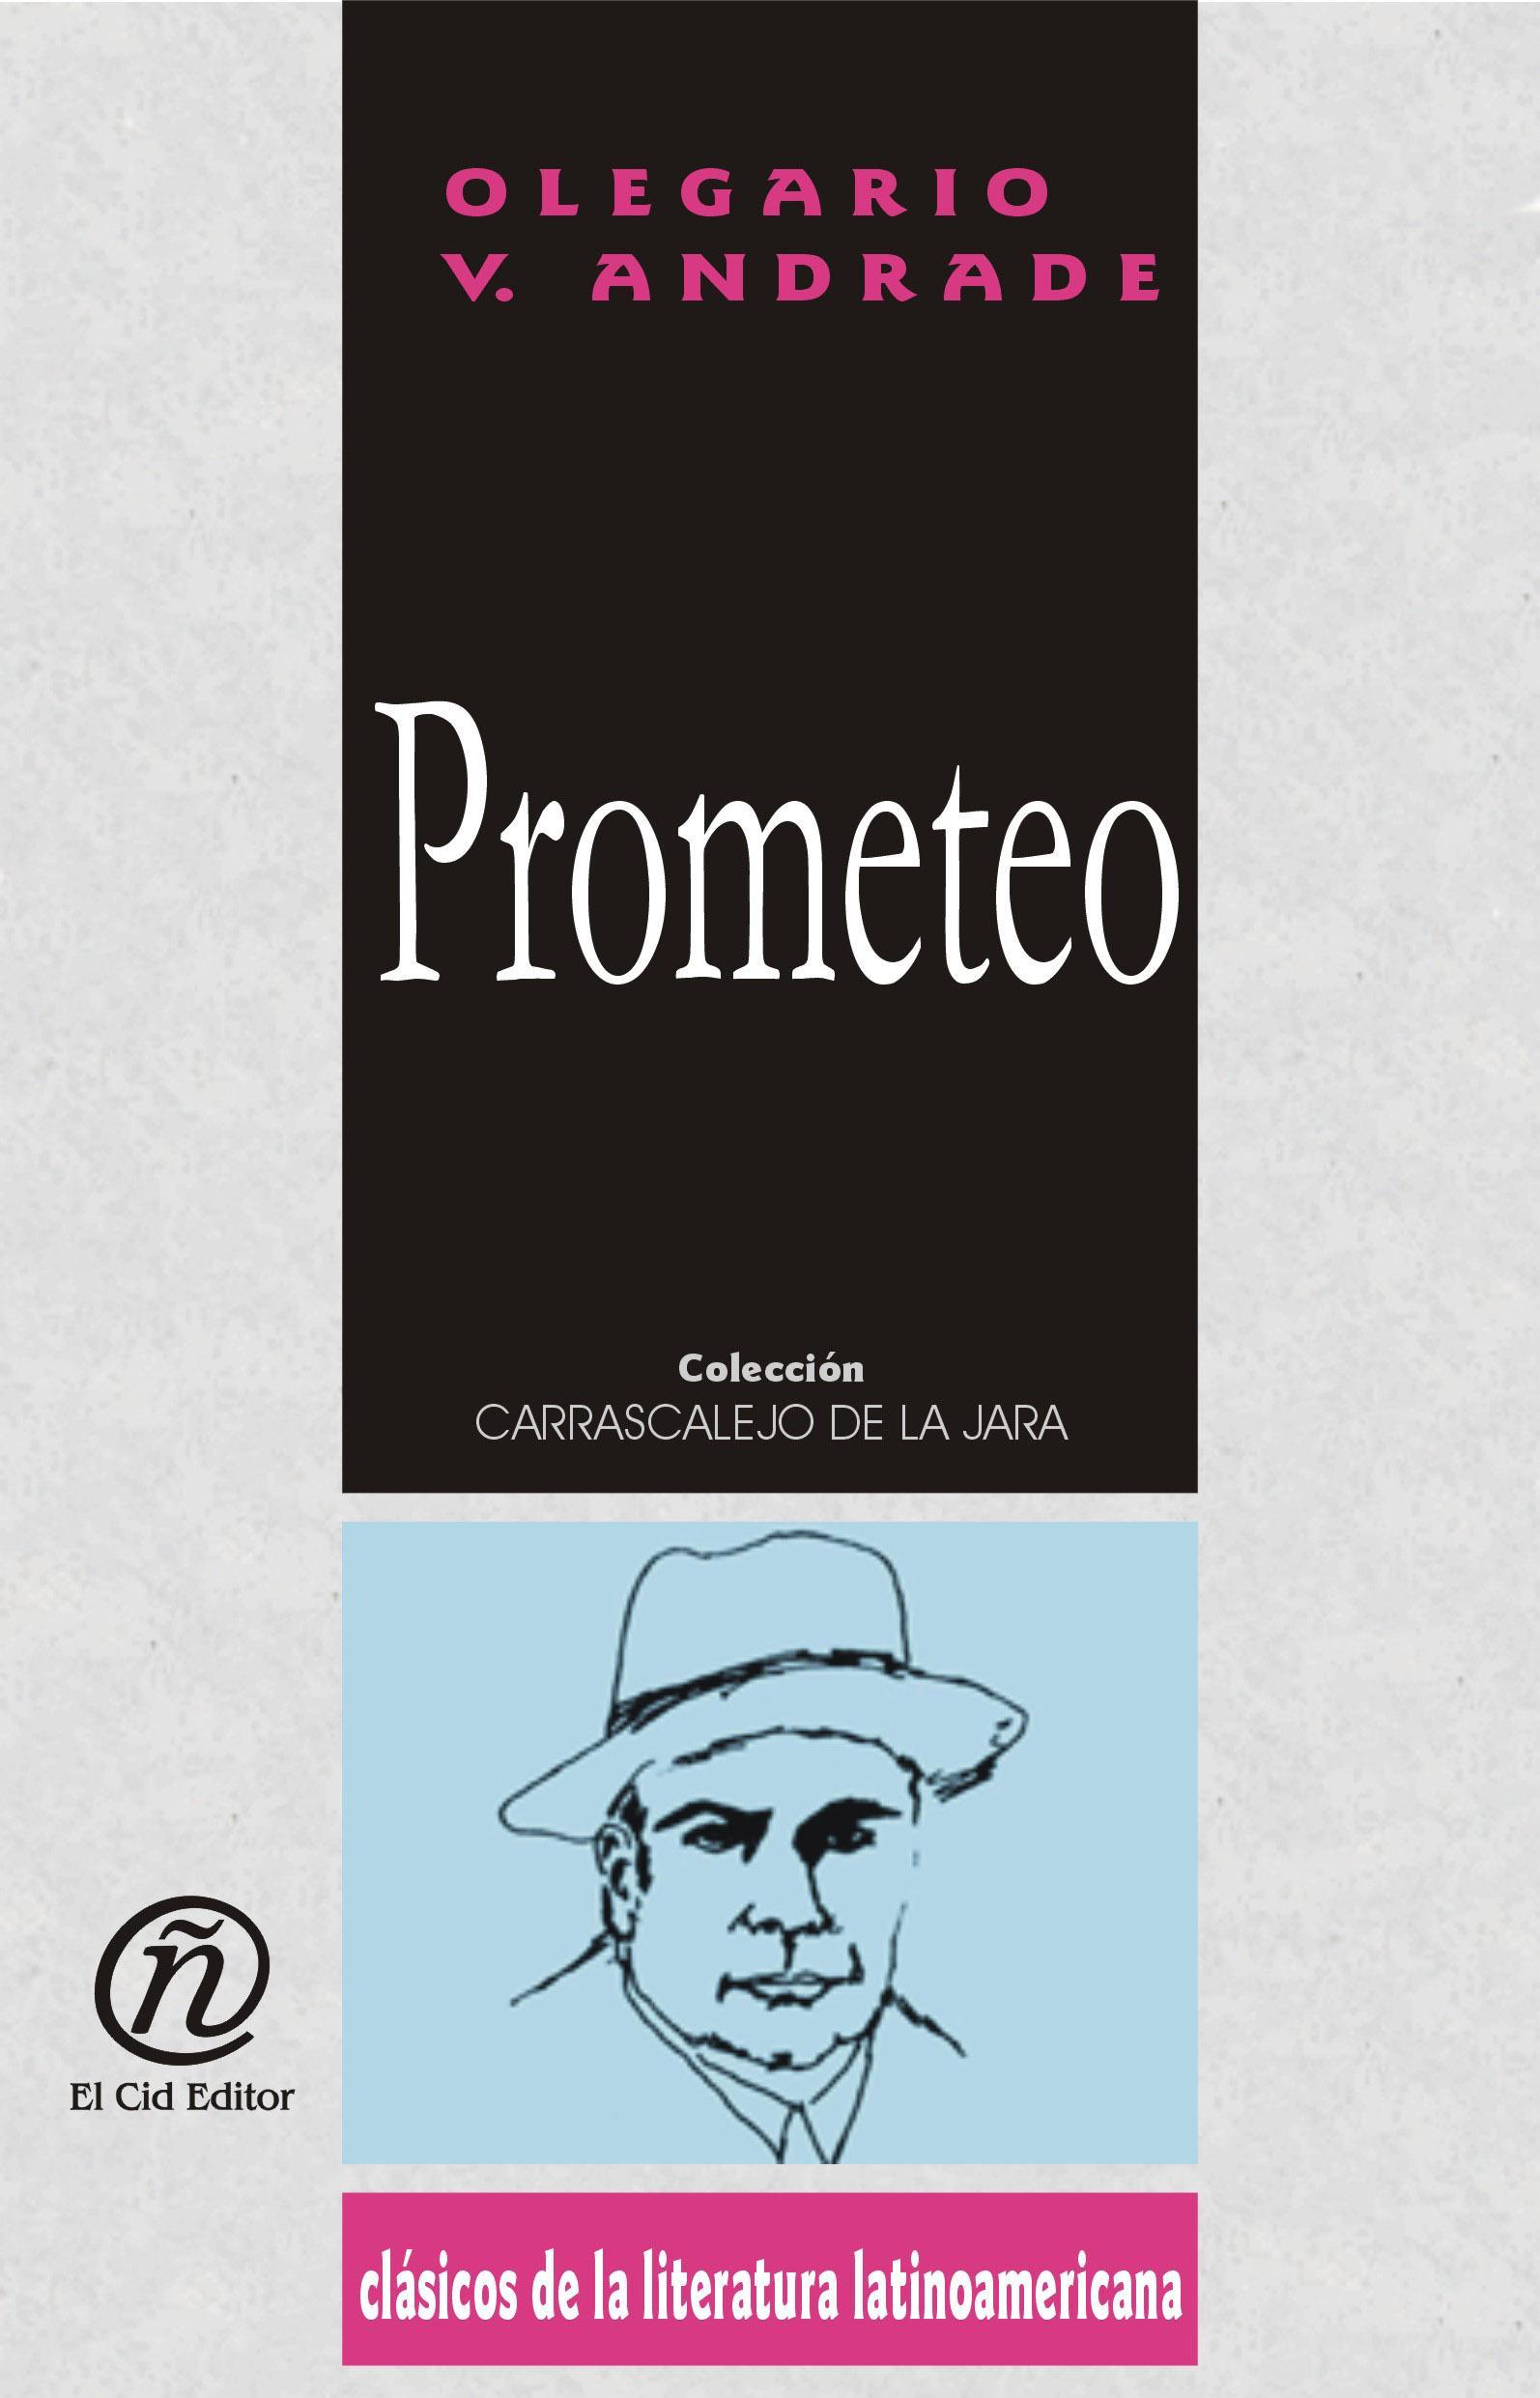 "Prometeo: Colecci?n de Cl?sicos de la Literatura Latinoamericana ""Carrascalejo de la Jara"""